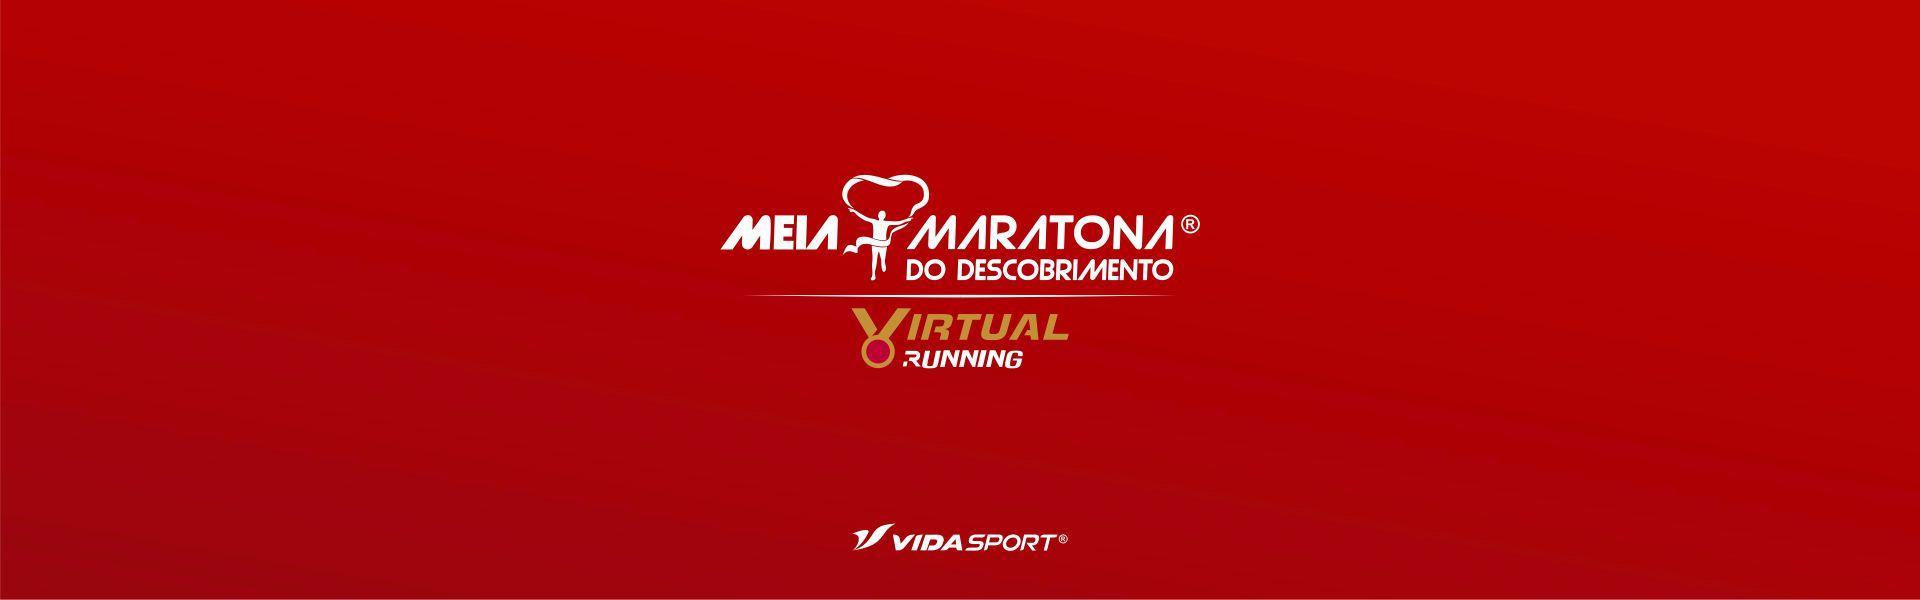 Meia Maratona do Descobrimento Virtual